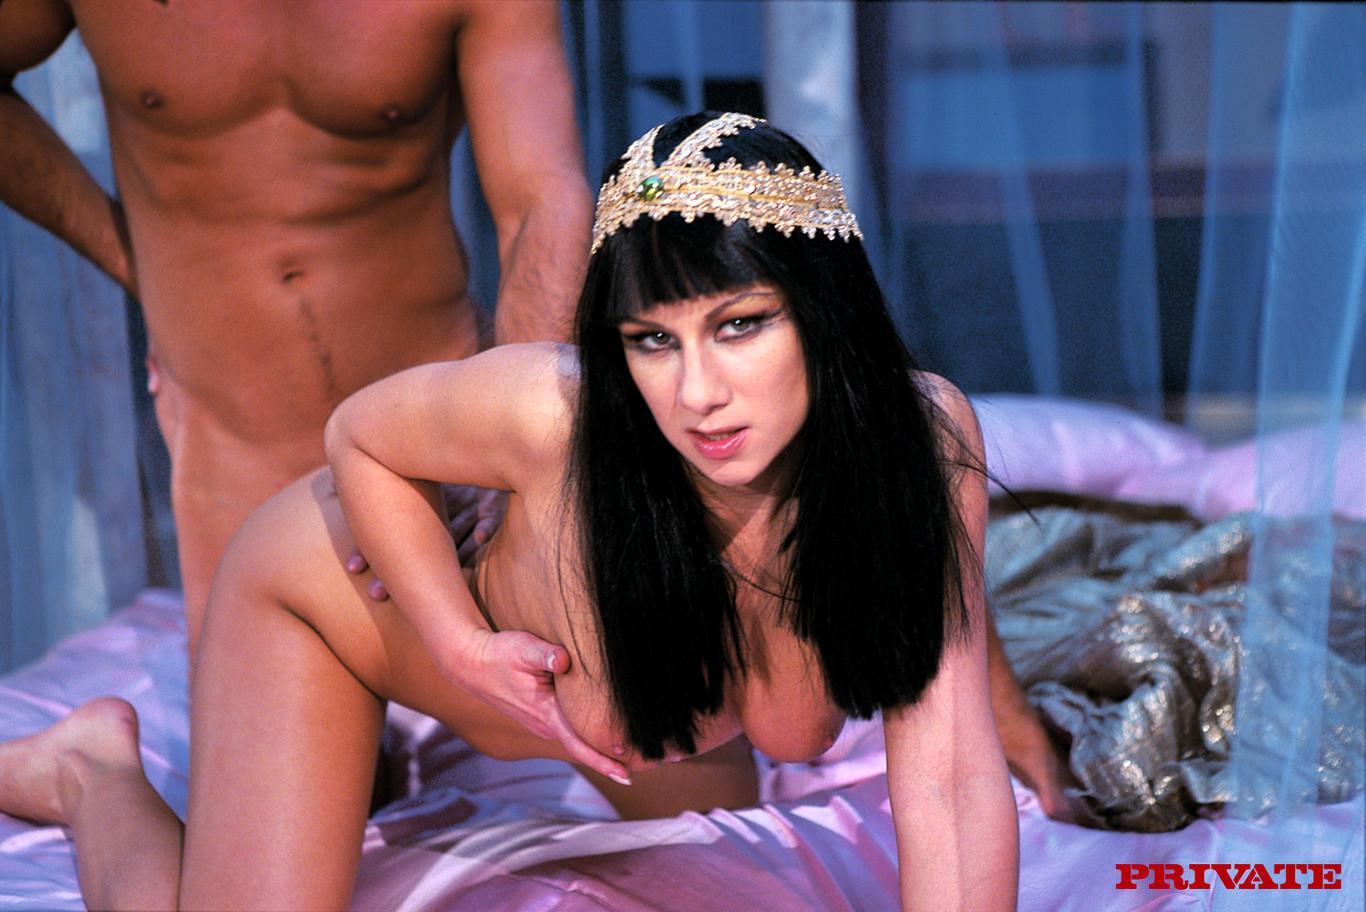 porno-video-s-tsaritsami-razvrat-na-prieme-u-ginekologa-skritaya-kamera-porno-onlayn